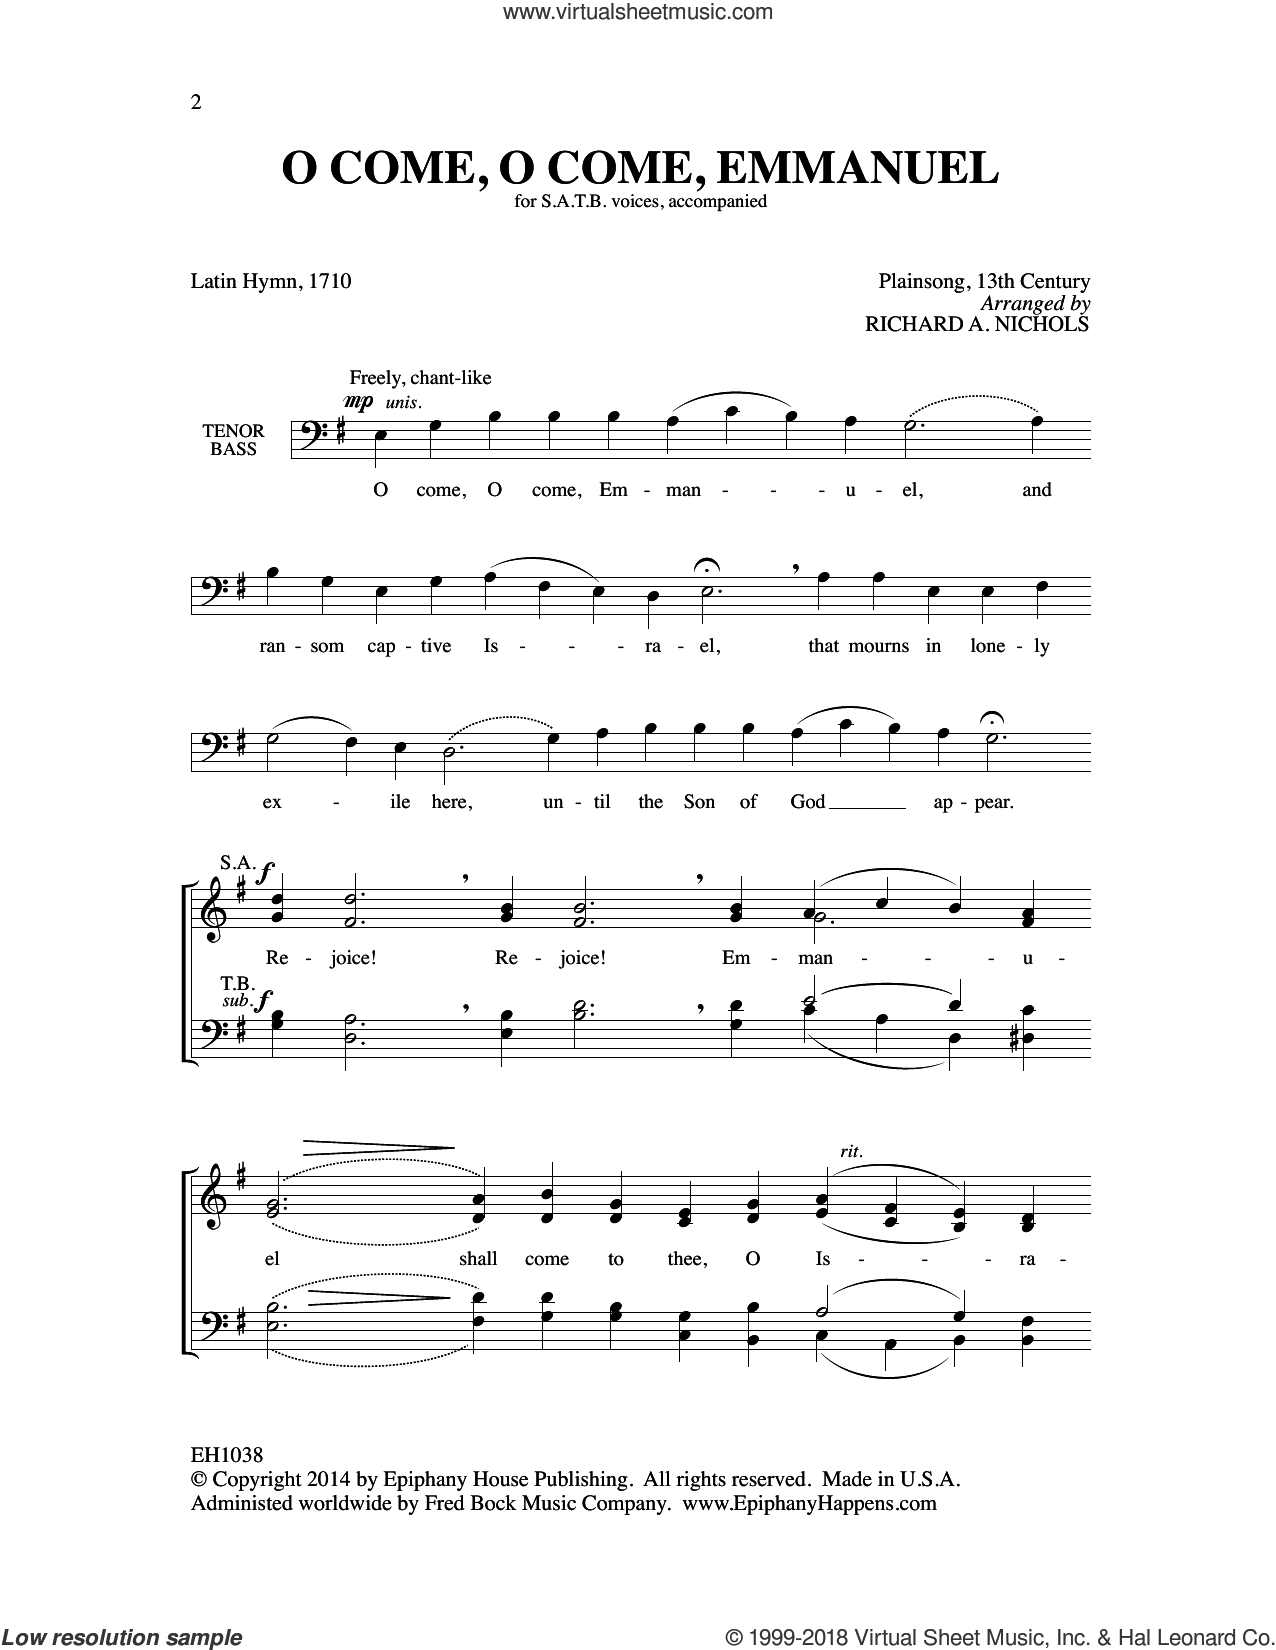 O Come, O Come, Emmanuel sheet music for choir (SATB: soprano, alto, tenor, bass) by Richard A. Nichols, intermediate skill level